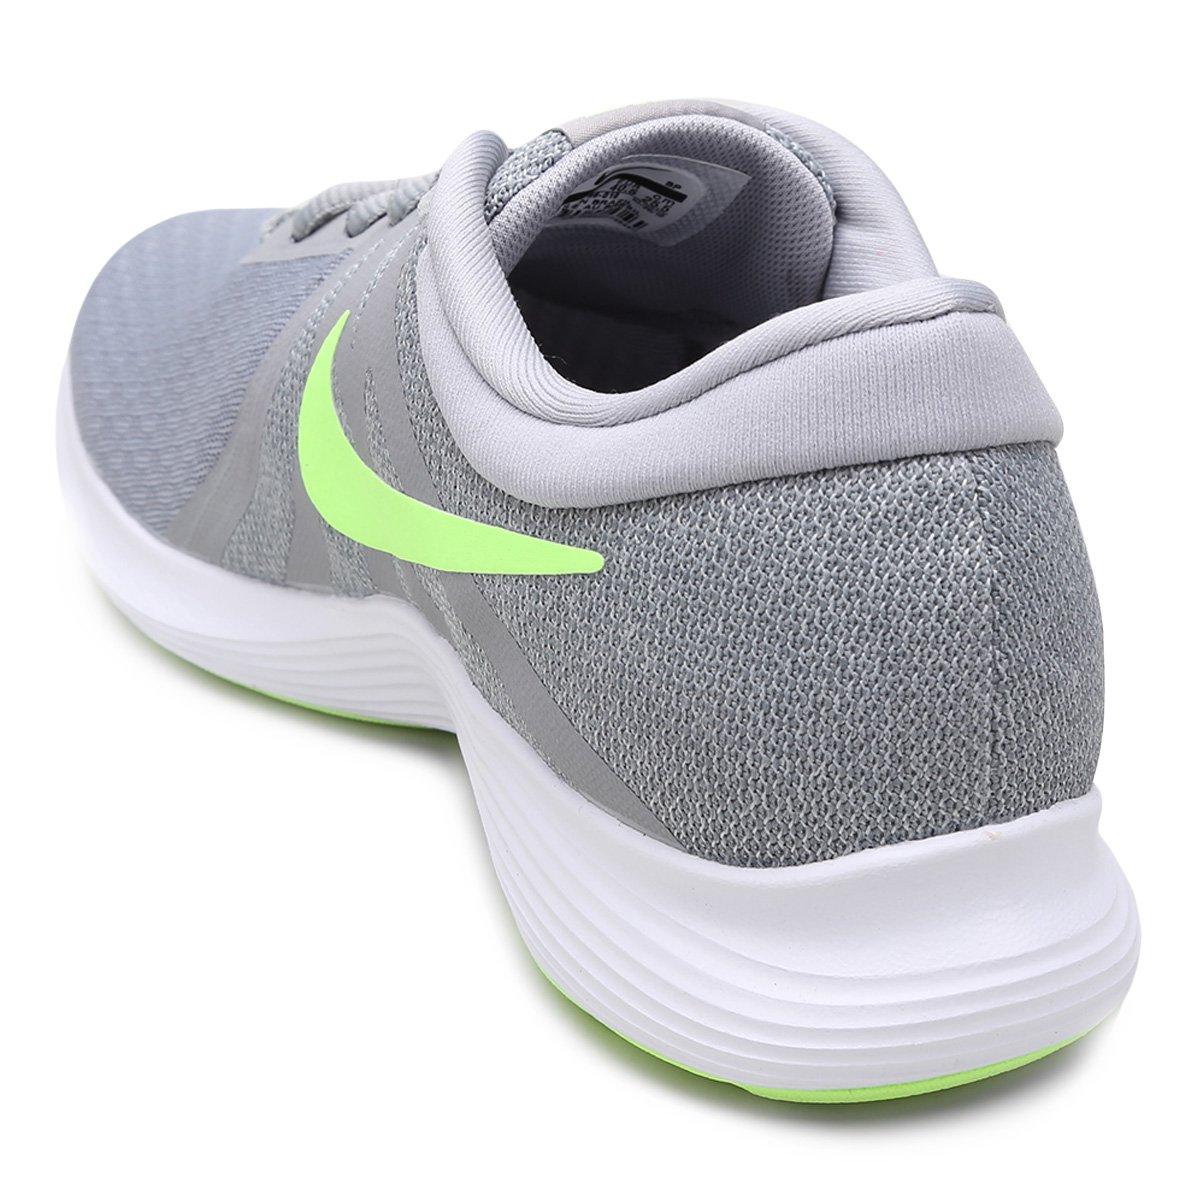 Tênis Nike Revolution 4 Masculino  Tênis Nike Revolution 4 Masculino ... 0985668768c15